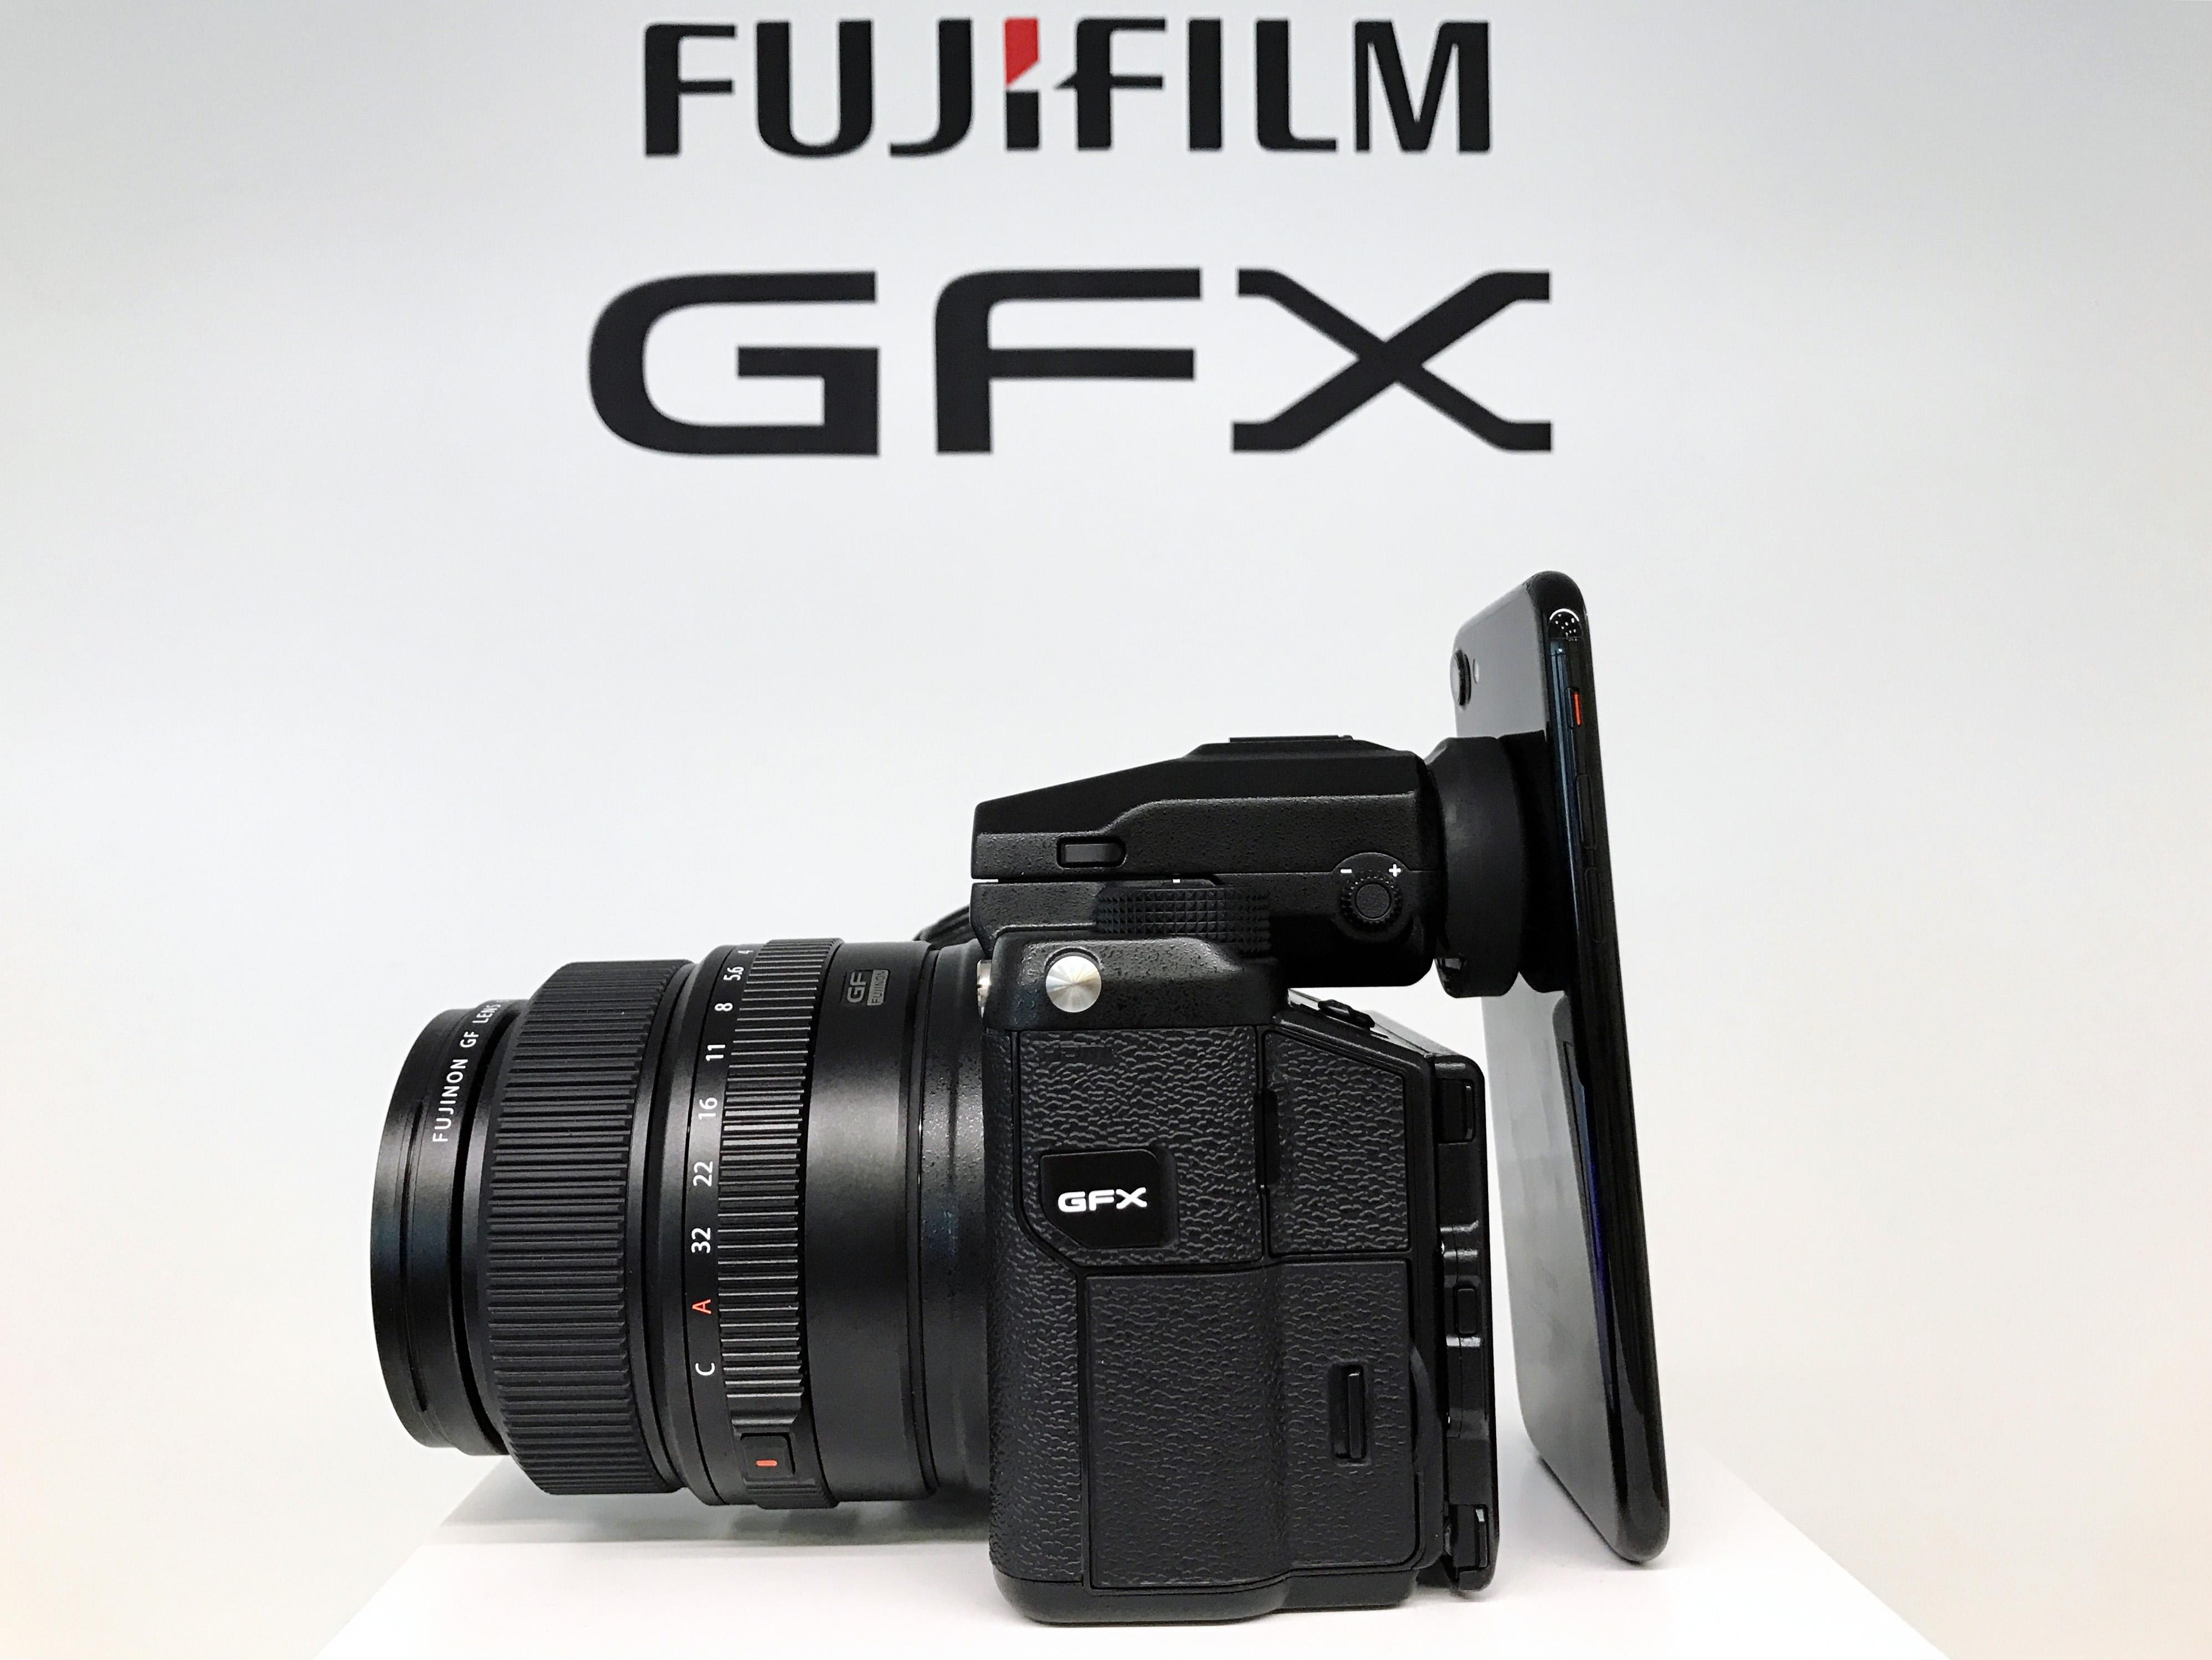 fujifilm gfx and iphone 7